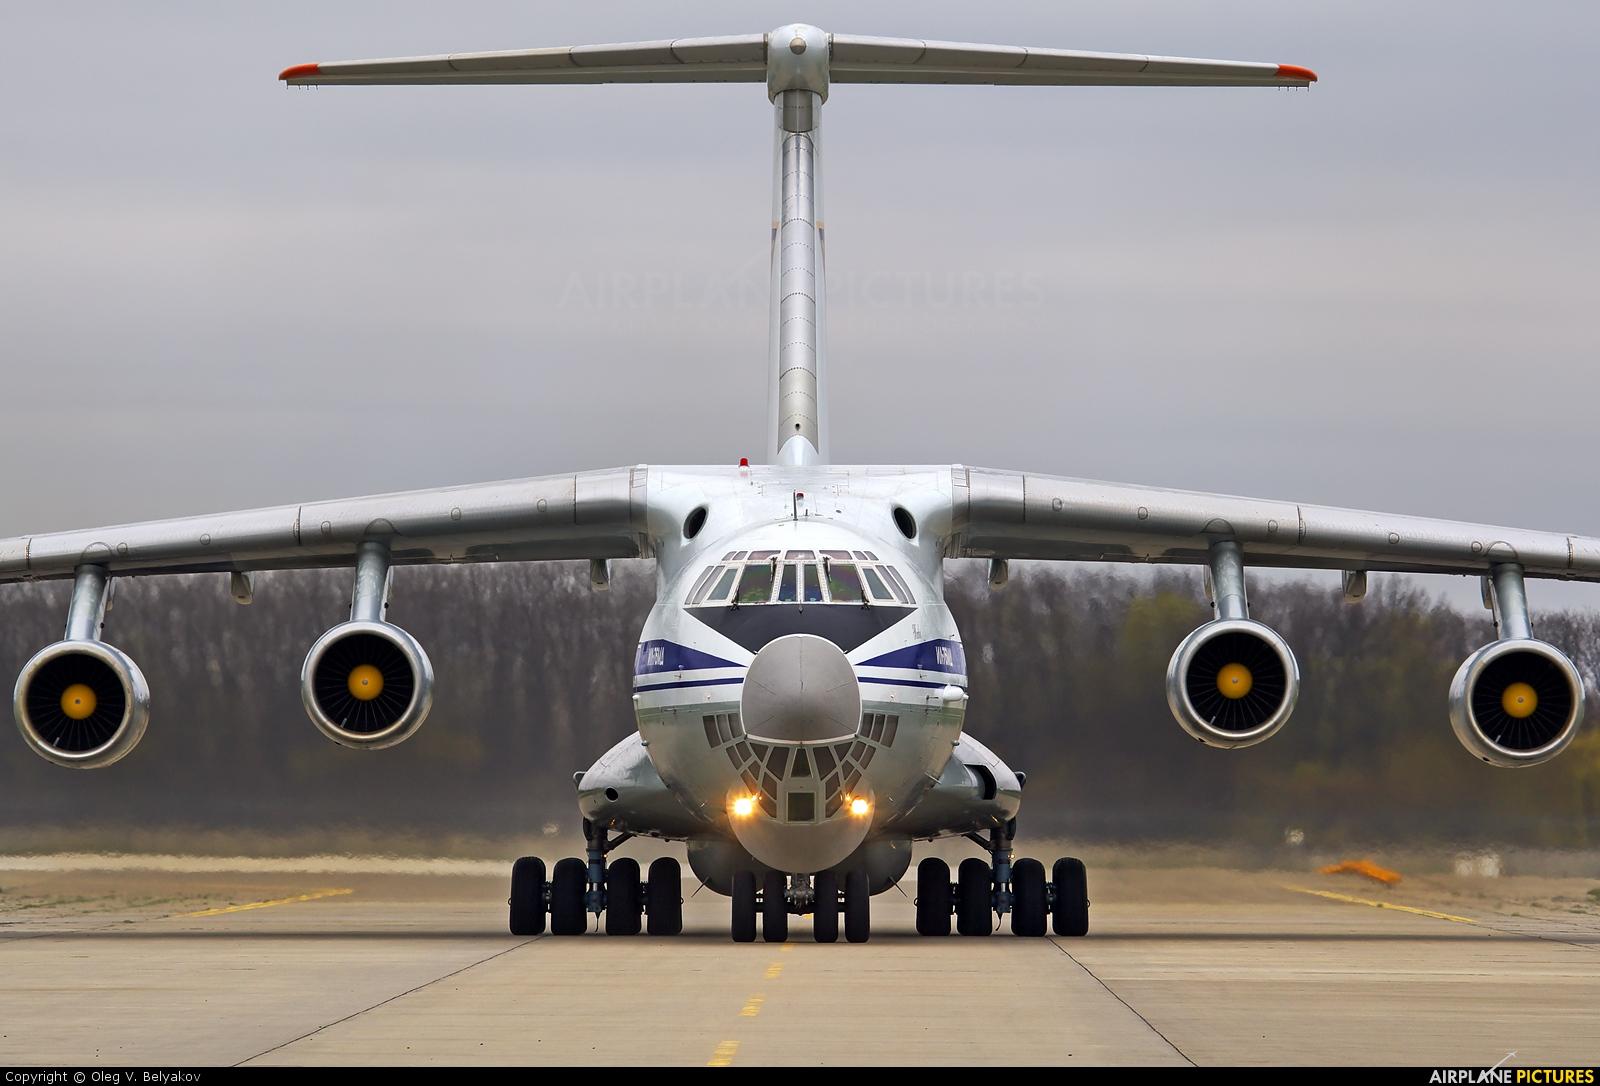 Ukraine - Air Force 78820 aircraft at Kiev - Borispol